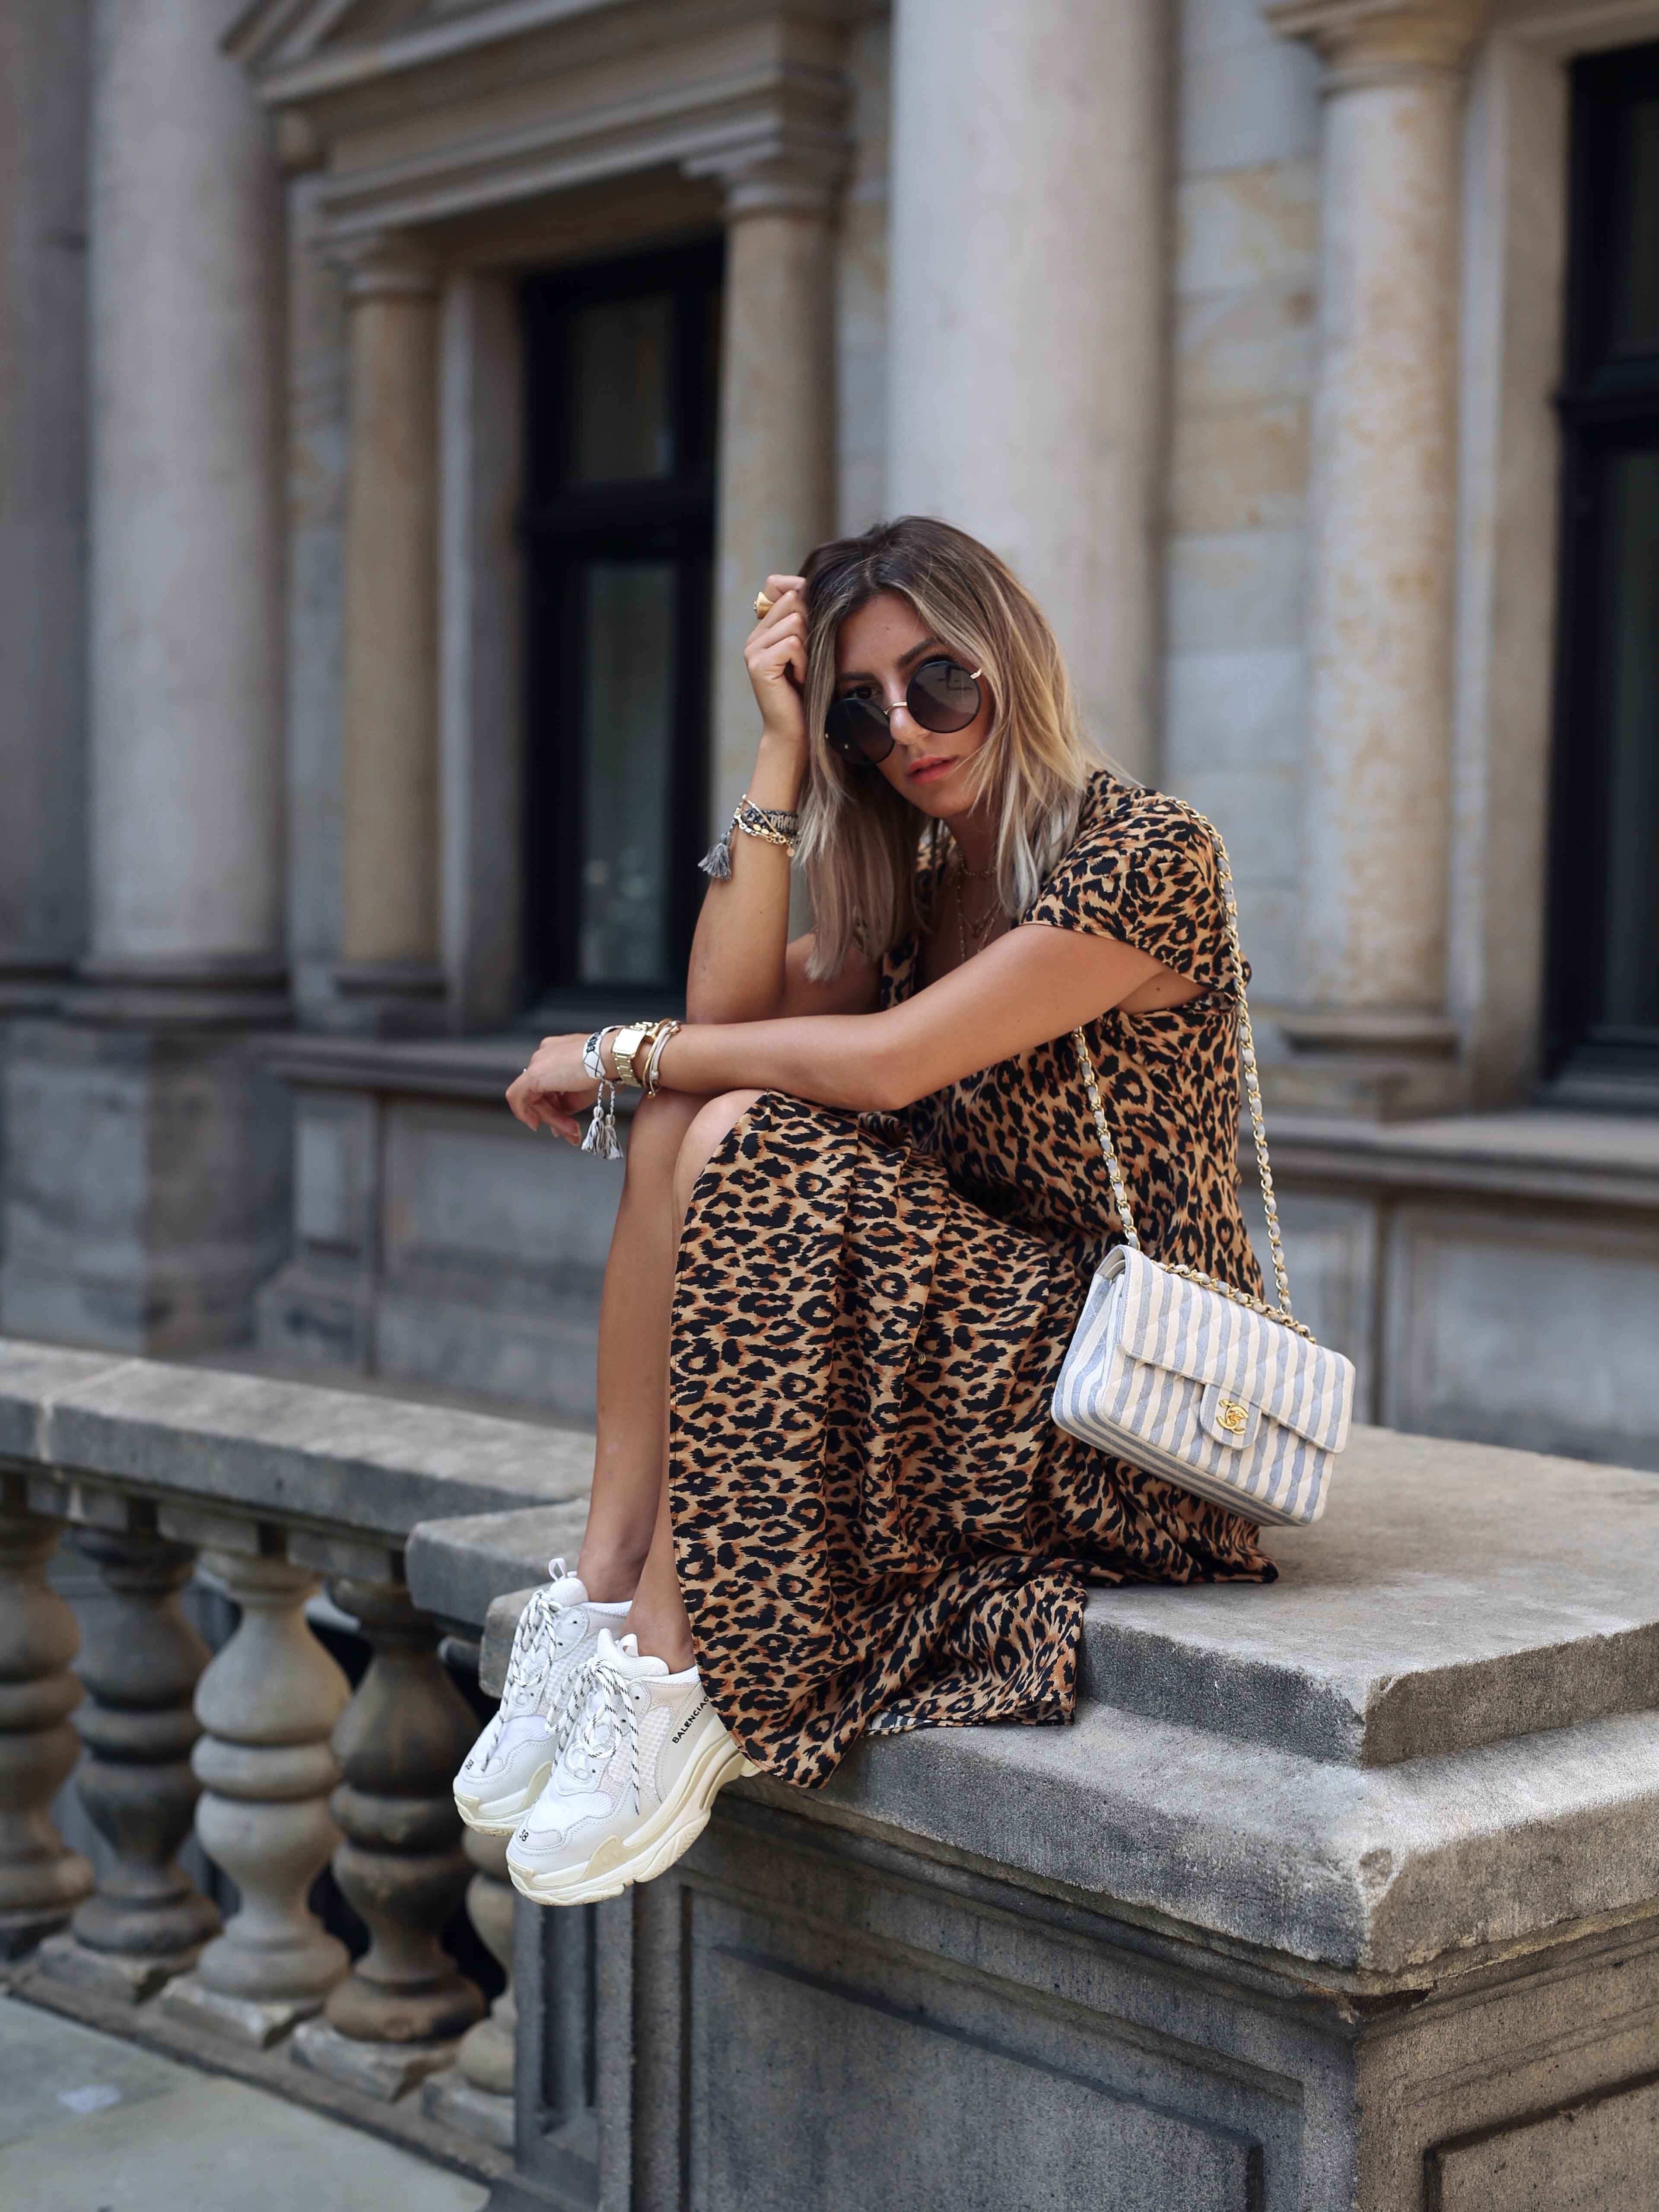 Aylin Love König ReportLeo Pattern 2019Lange Trend In rdstxhQC